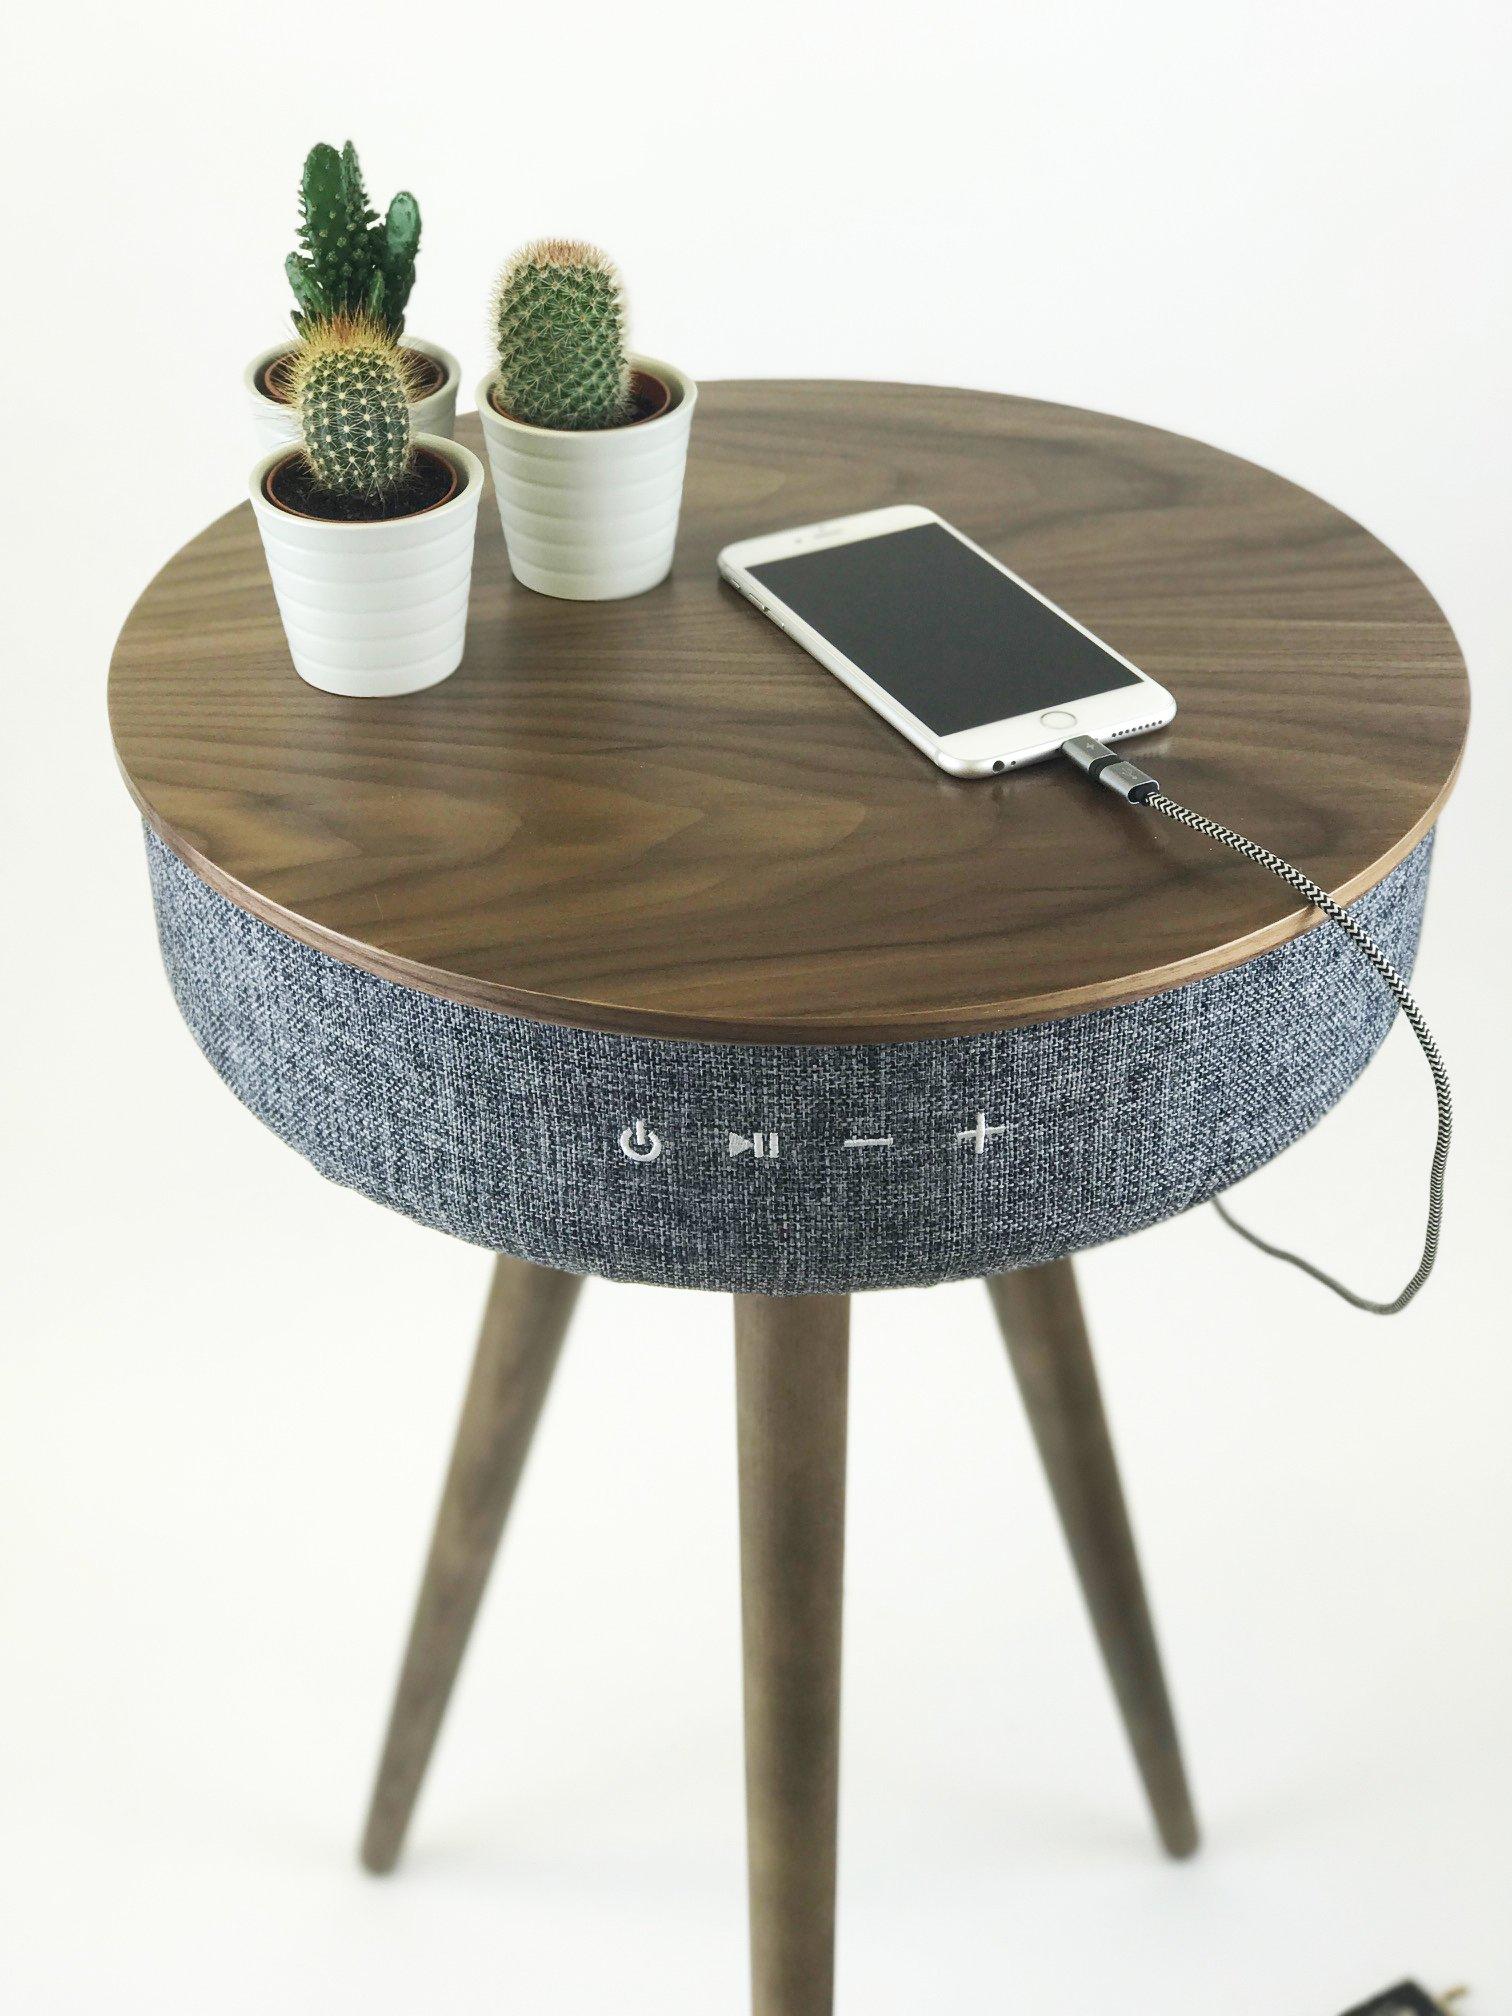 Steepletone TABBLUE 2.1 Bluetooth Sound System AUX Playback 2x USB Charging Sockets (Dark Wood)